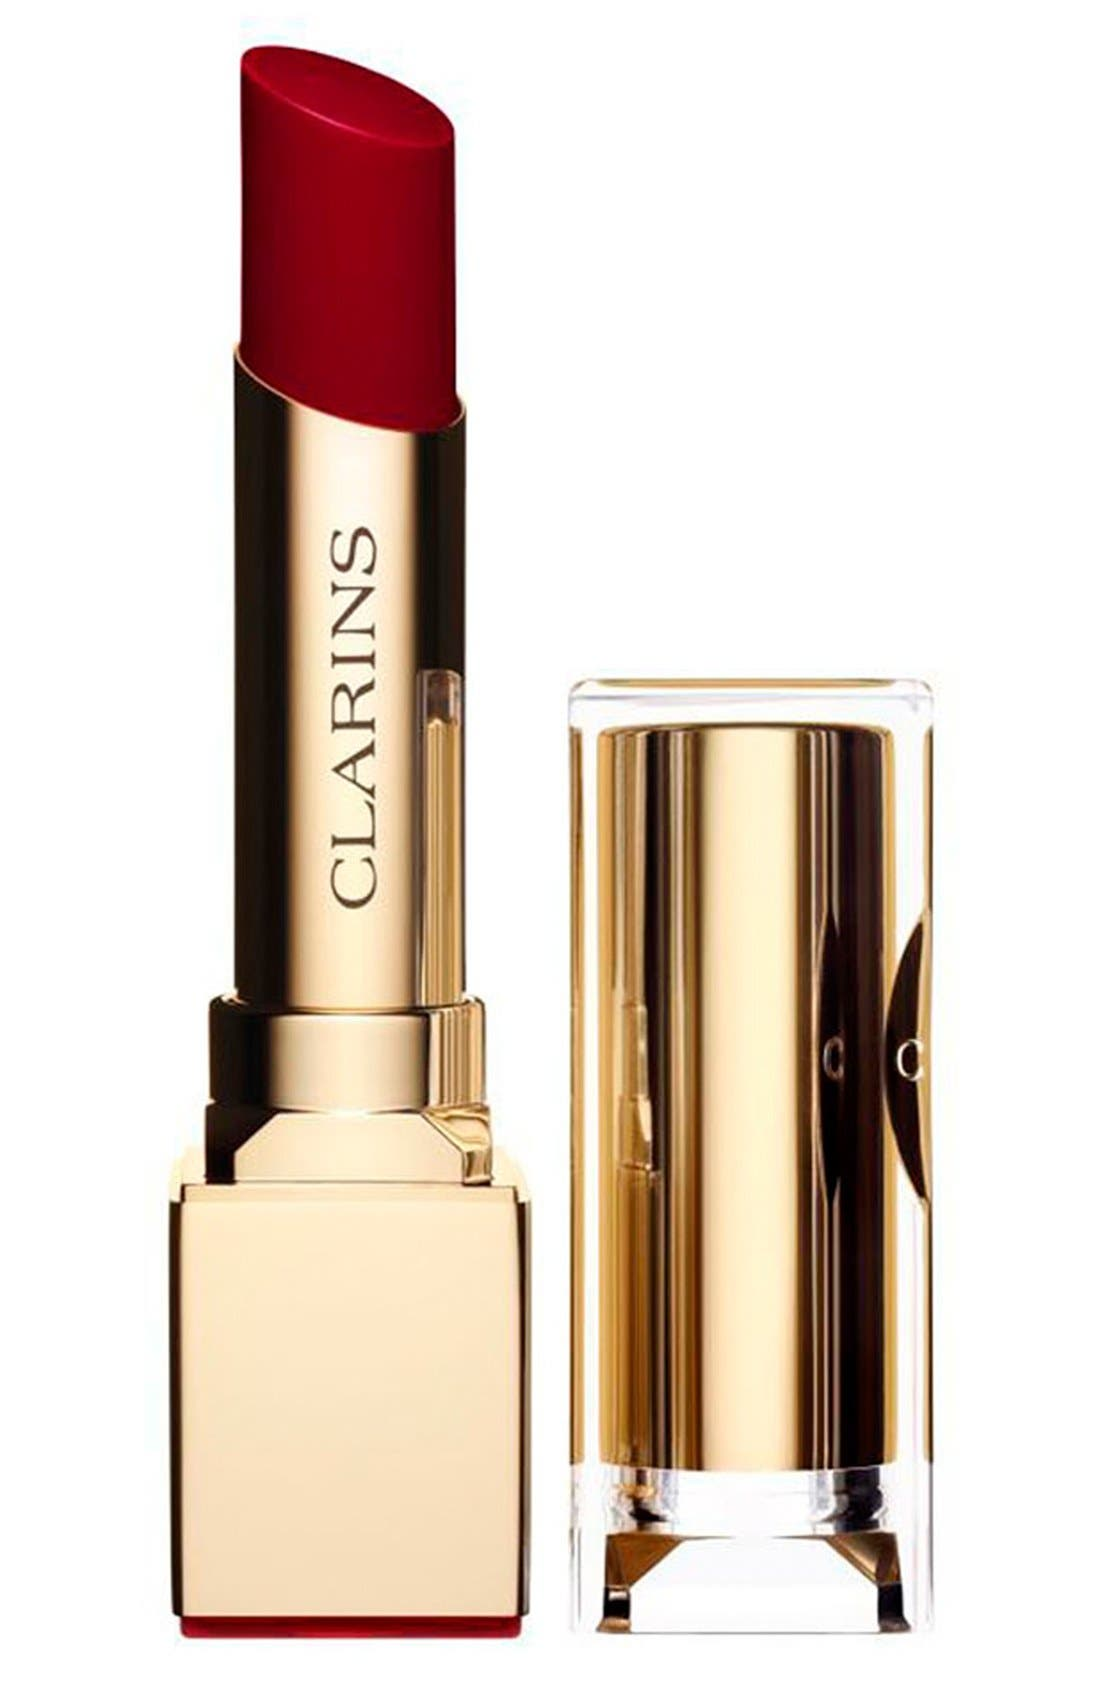 Clarins 'Rouge Eclat' Lipstick